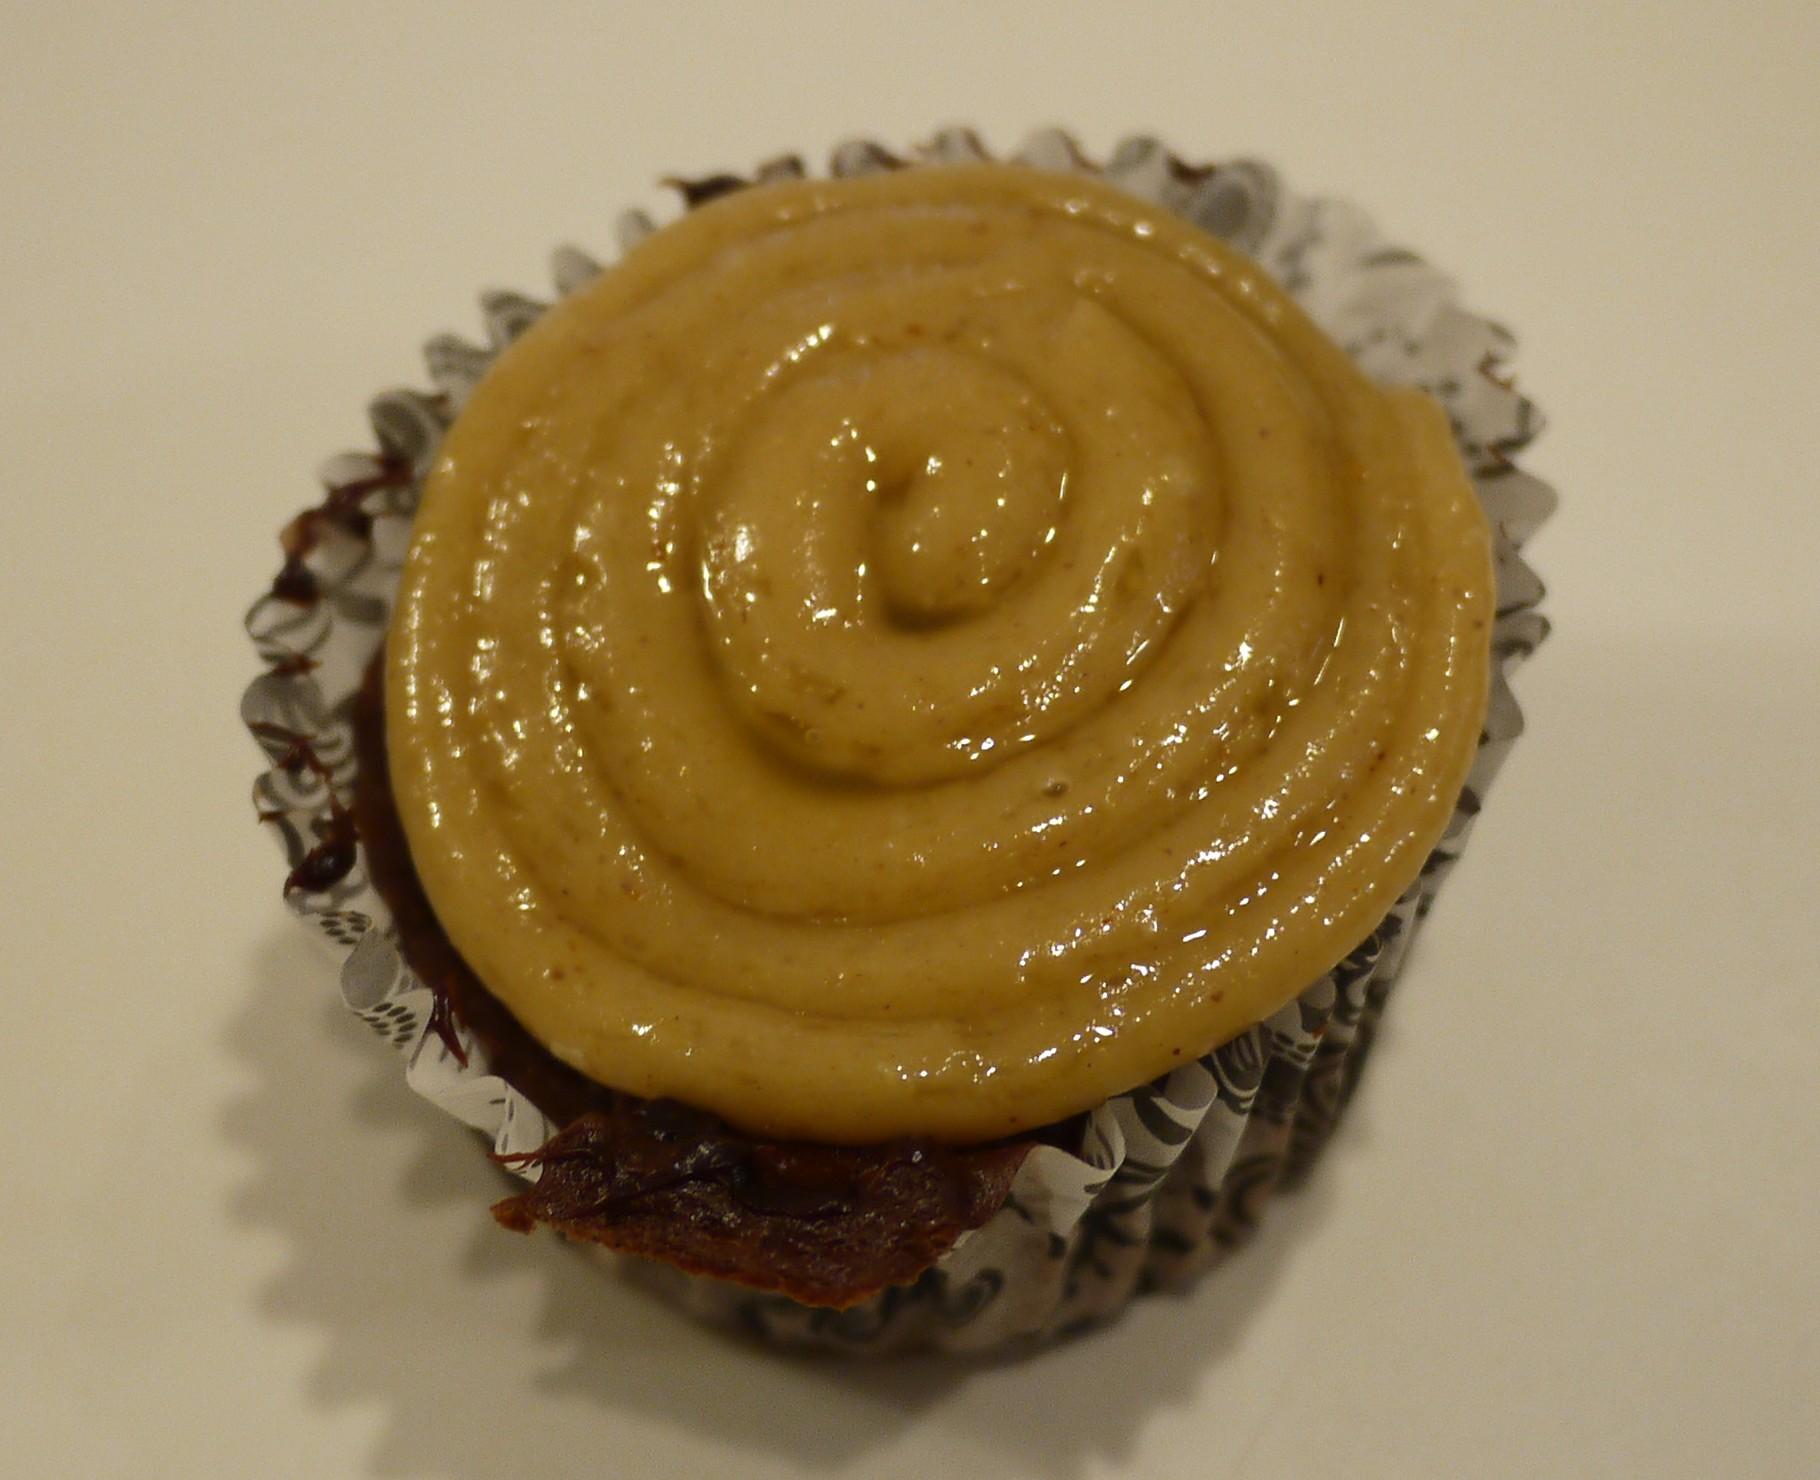 Recipes: Chocolate Cupcakes